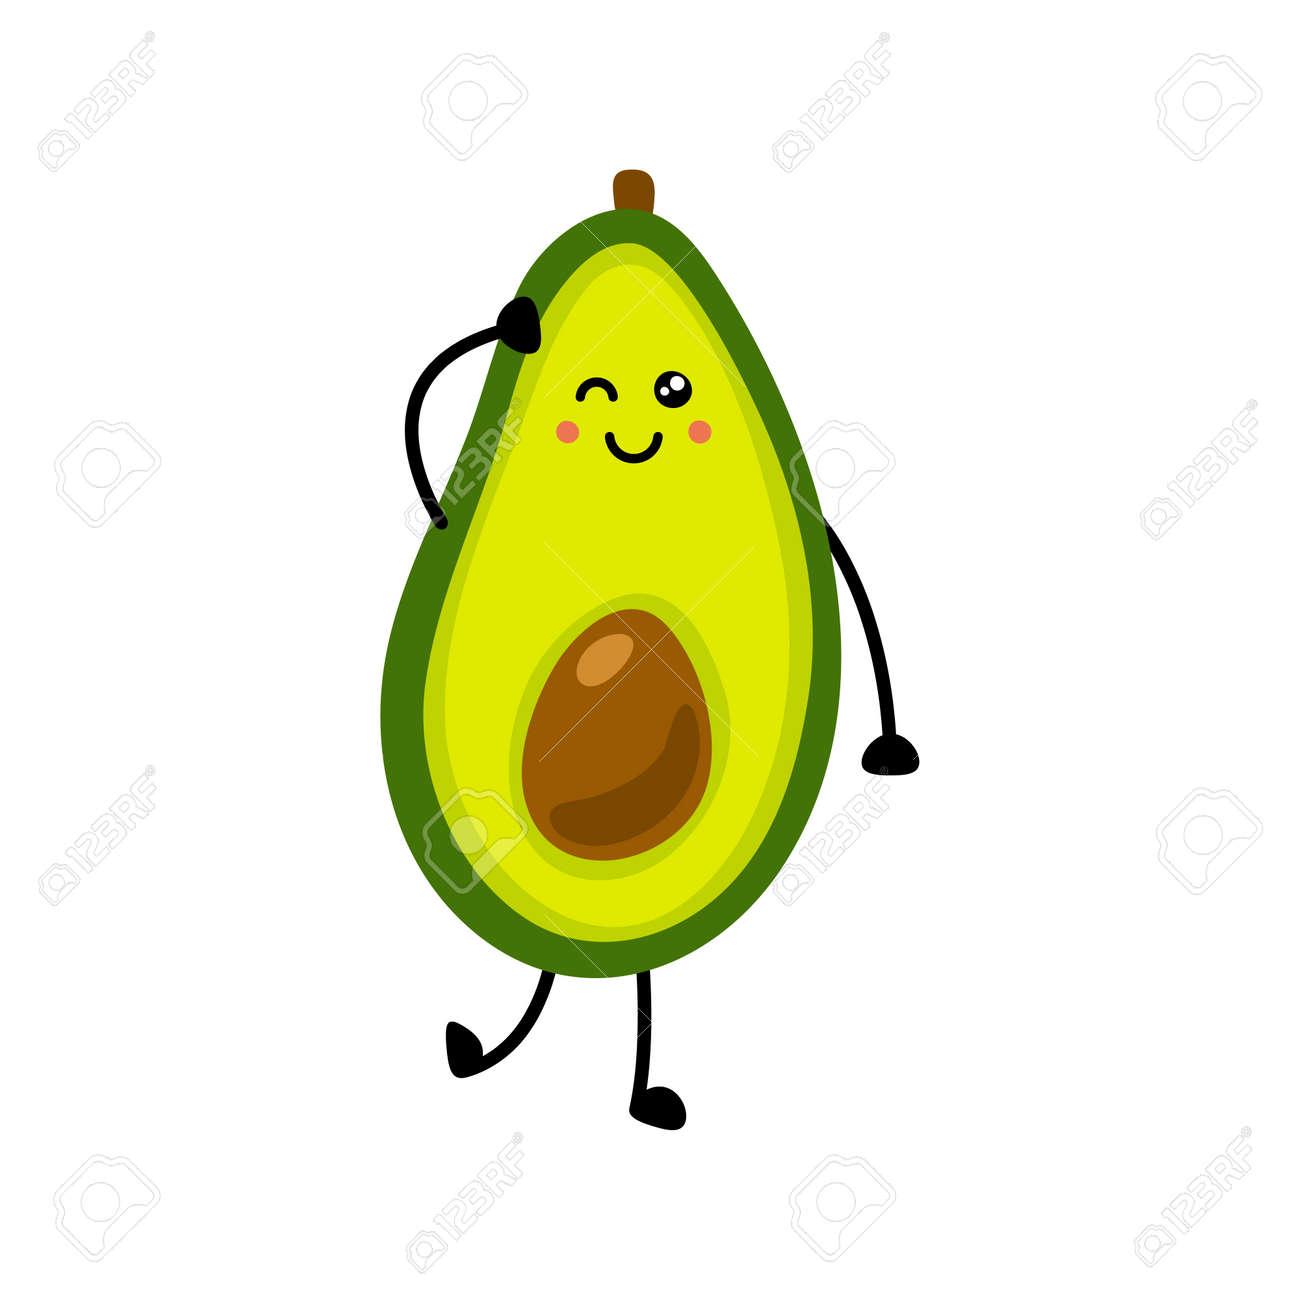 Avocado icon. Flat illustration of avocado vector icon isolated on white background. - 169772080